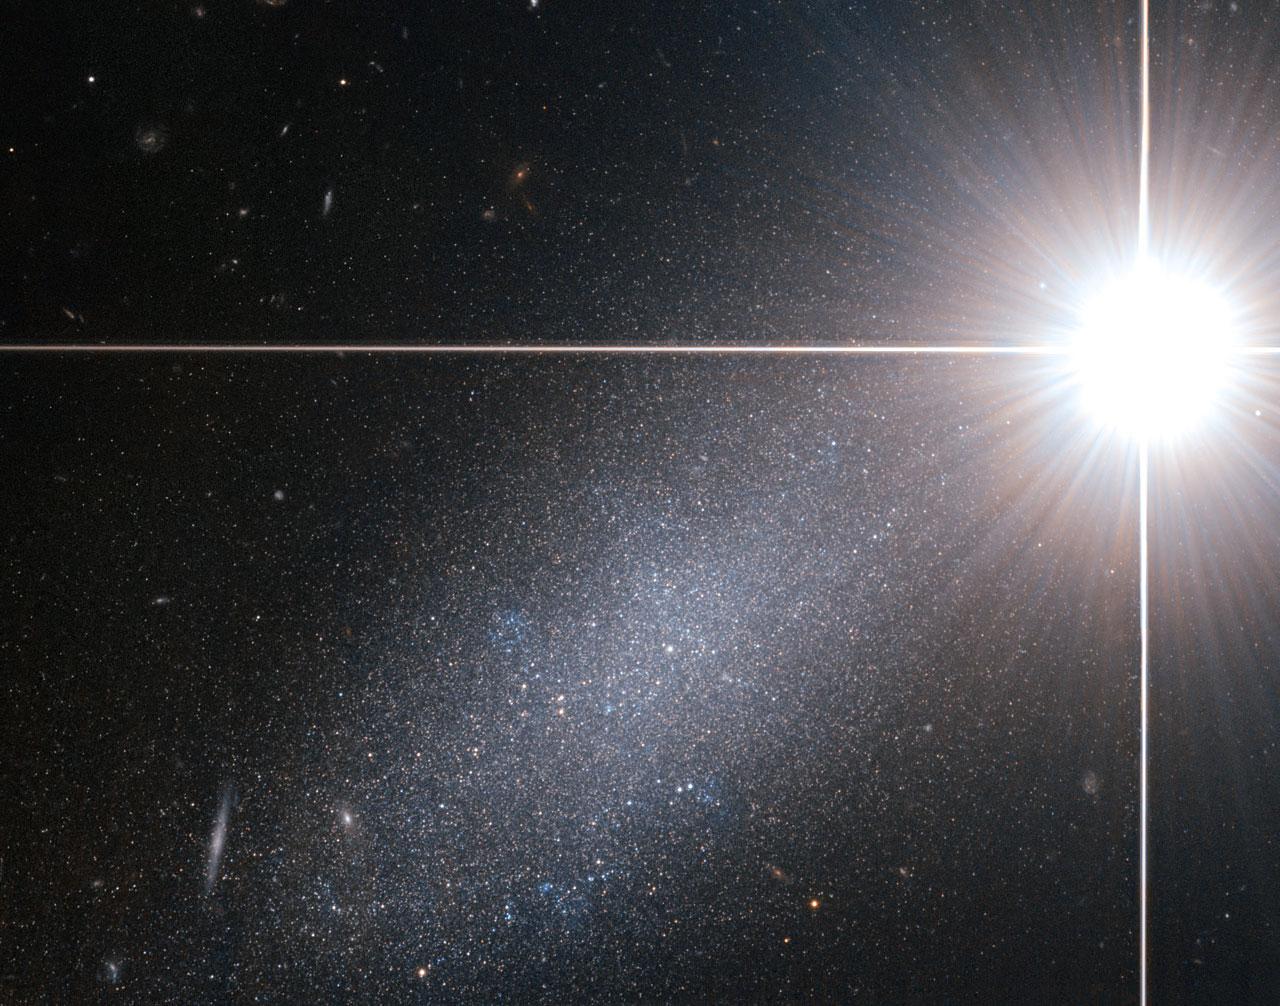 Bright star — faint galaxy